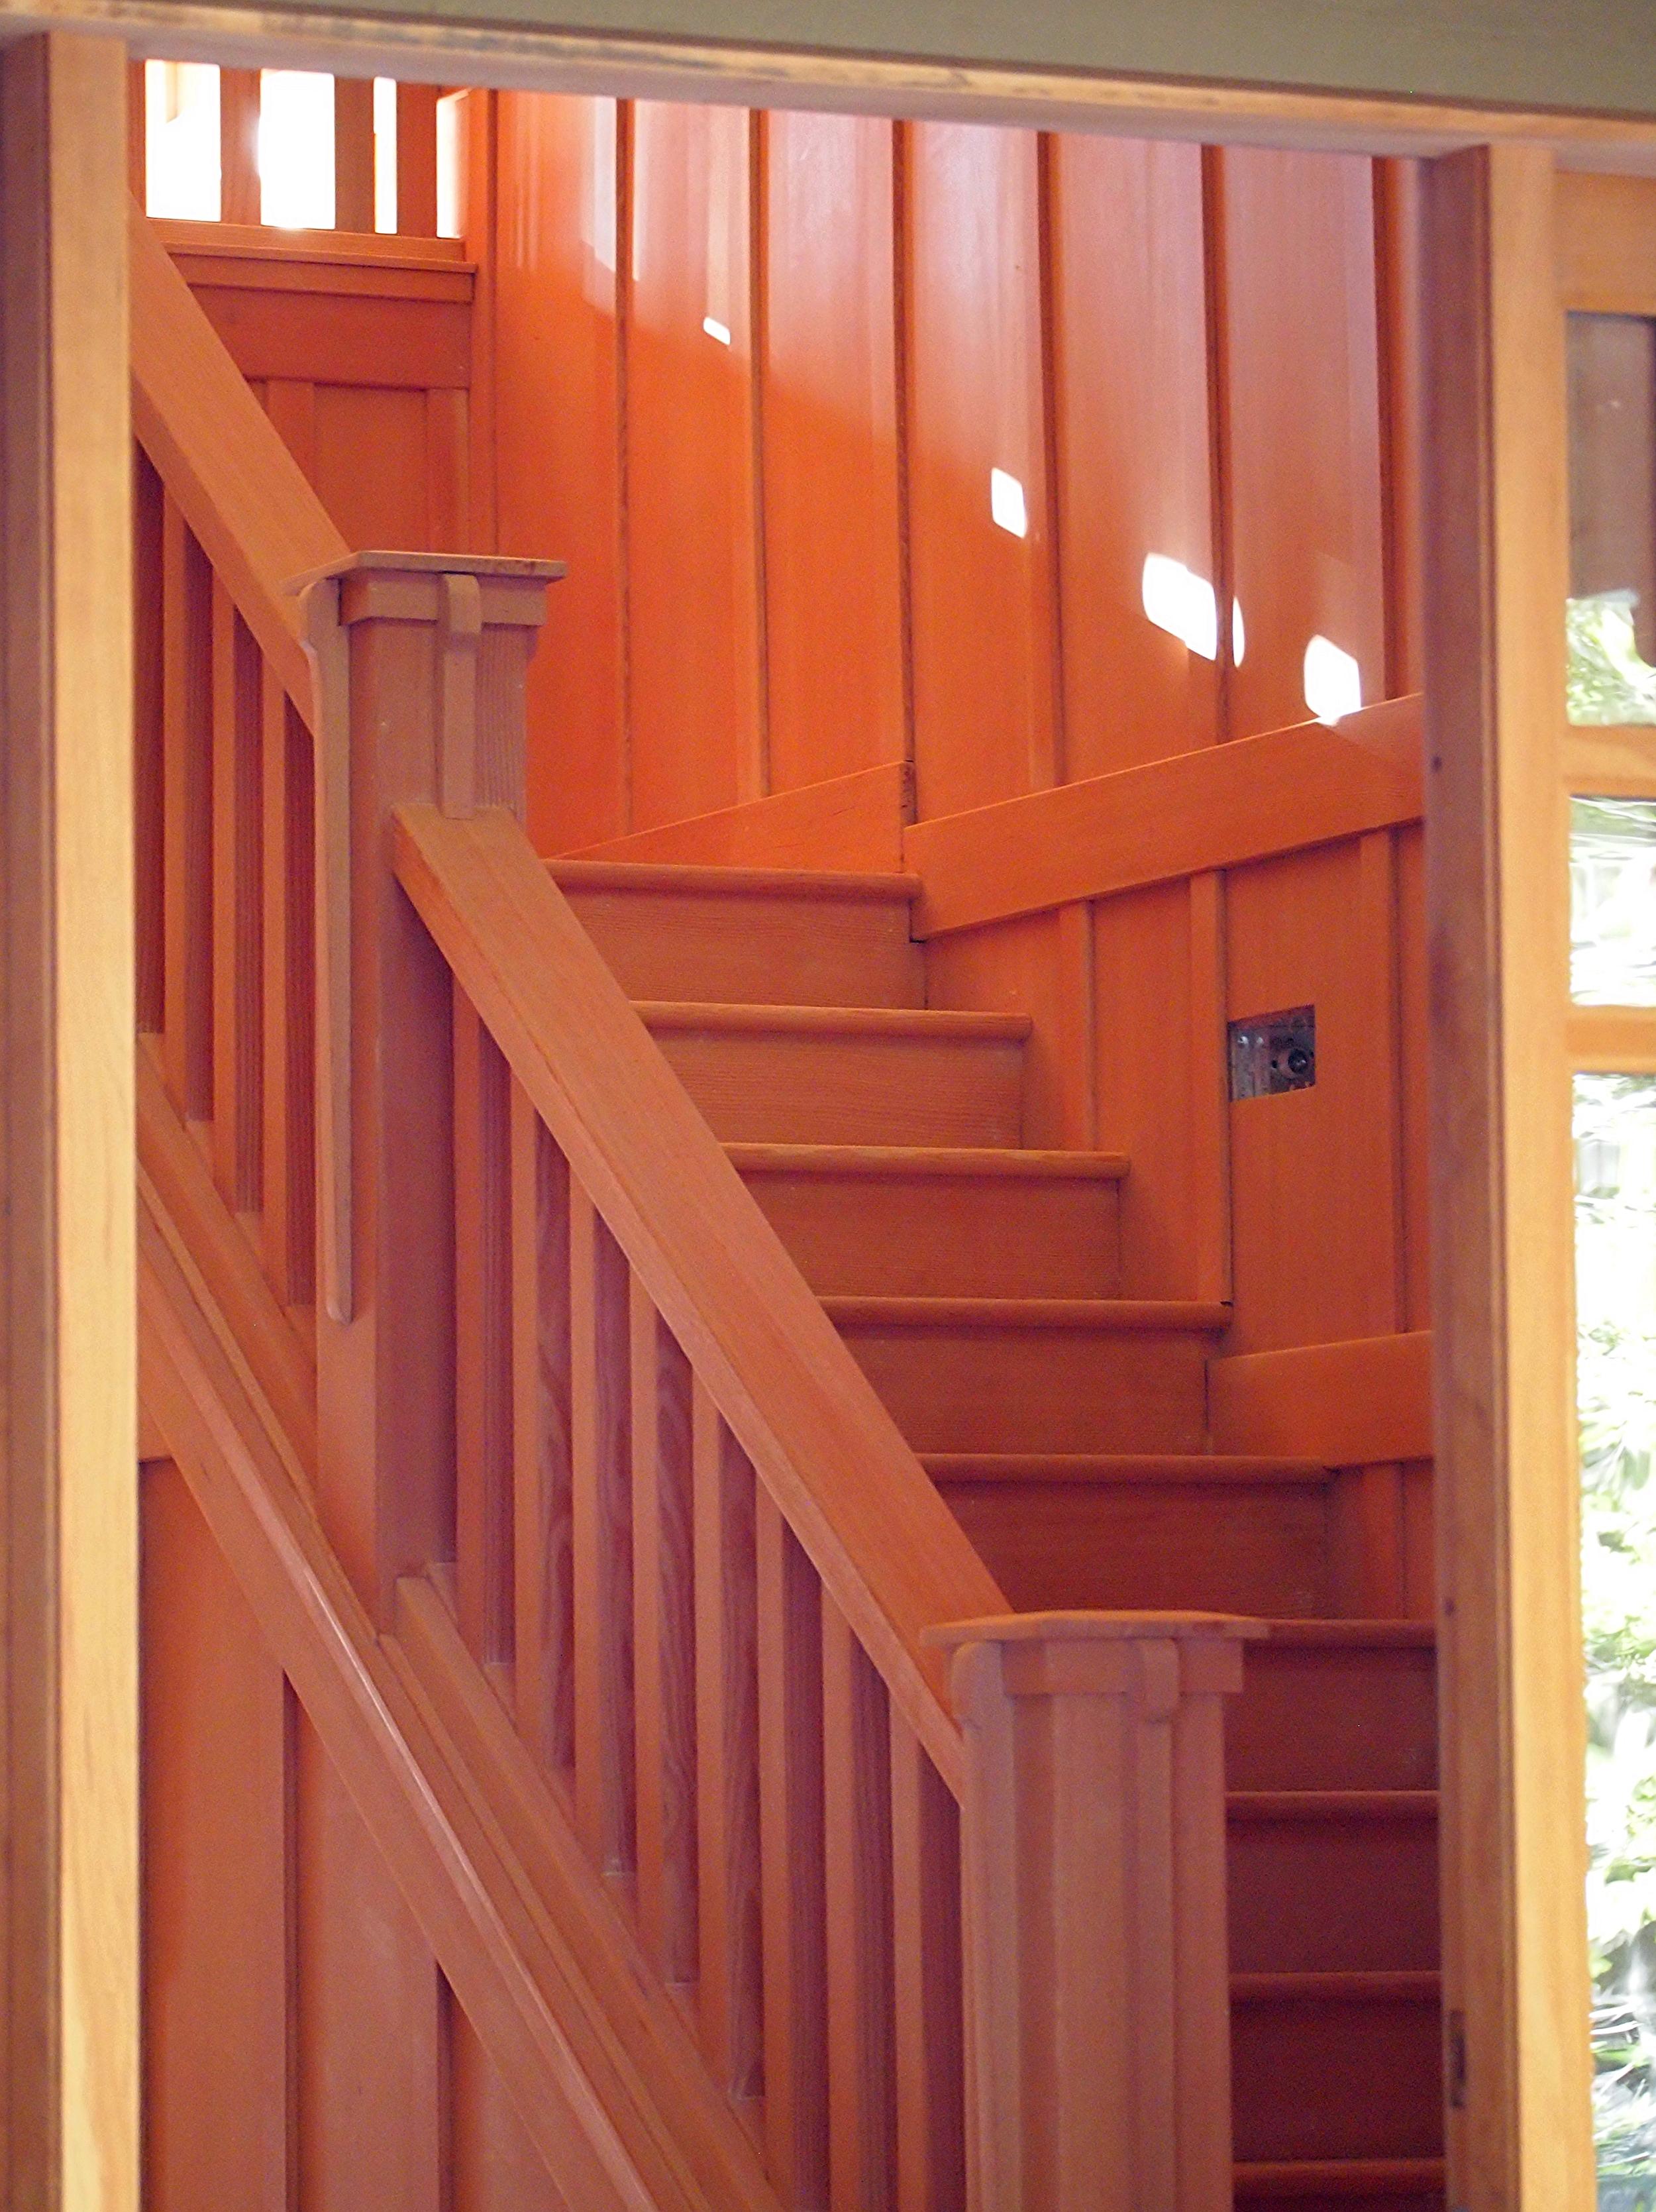 Vertical grain fir staircase in Arts & Crafts vineyard home